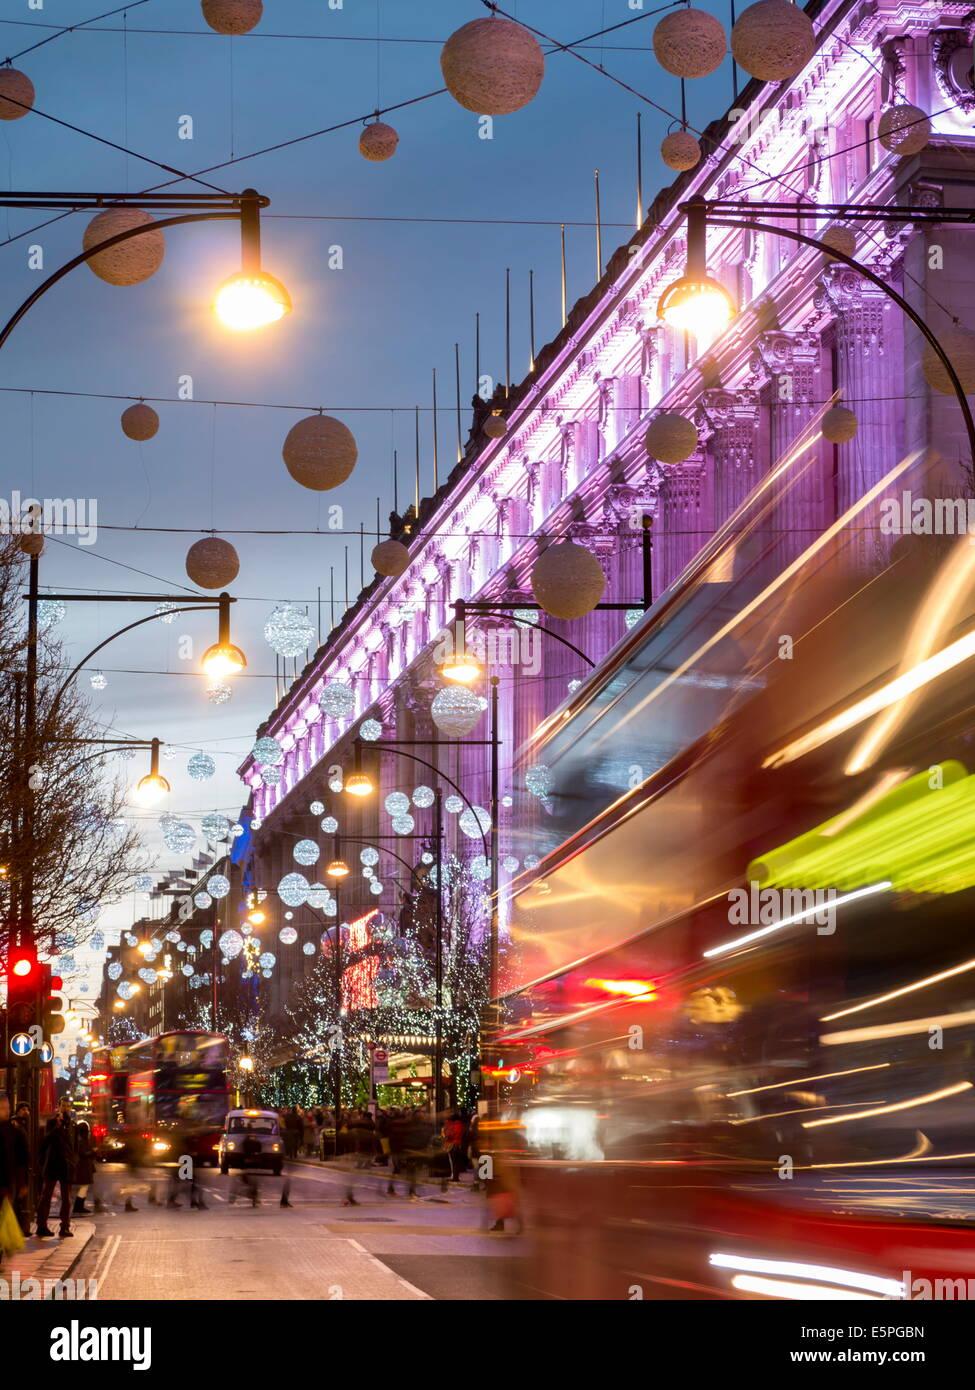 Selfridges on Oxford Street at Christmas, London, England, United Kingdom, Europe - Stock Image